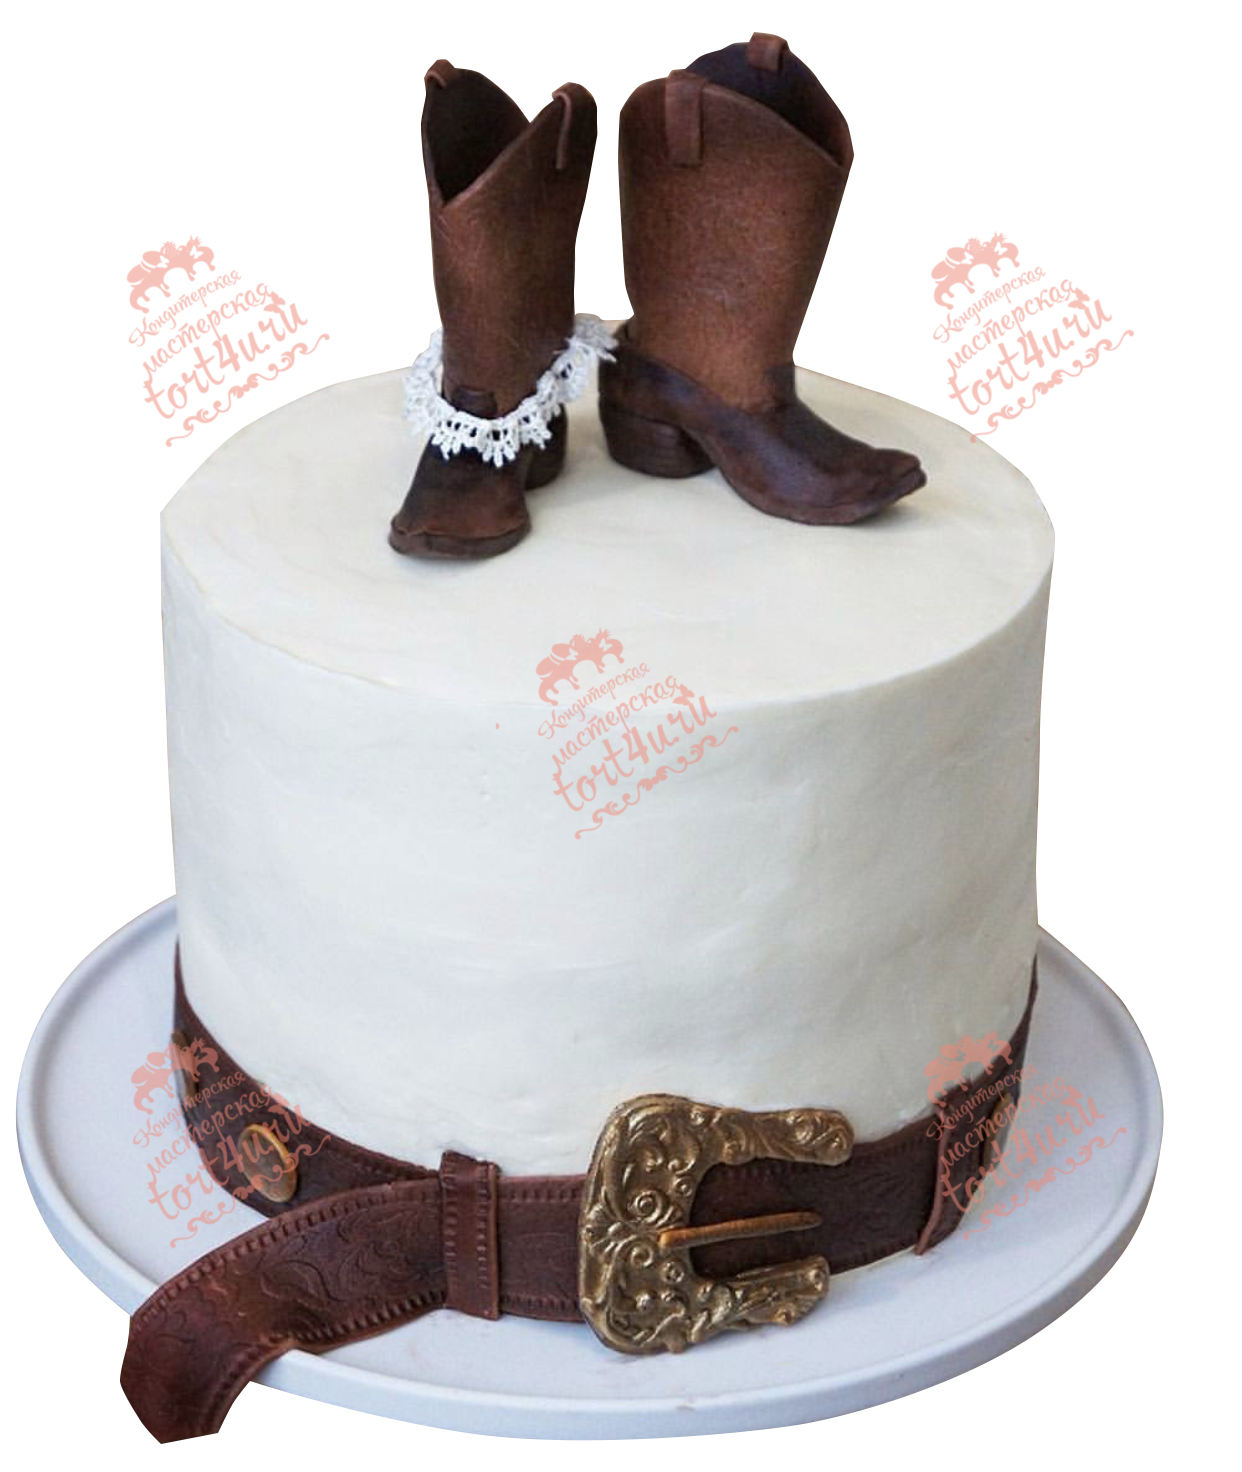 Кожаная свадьба торт фото